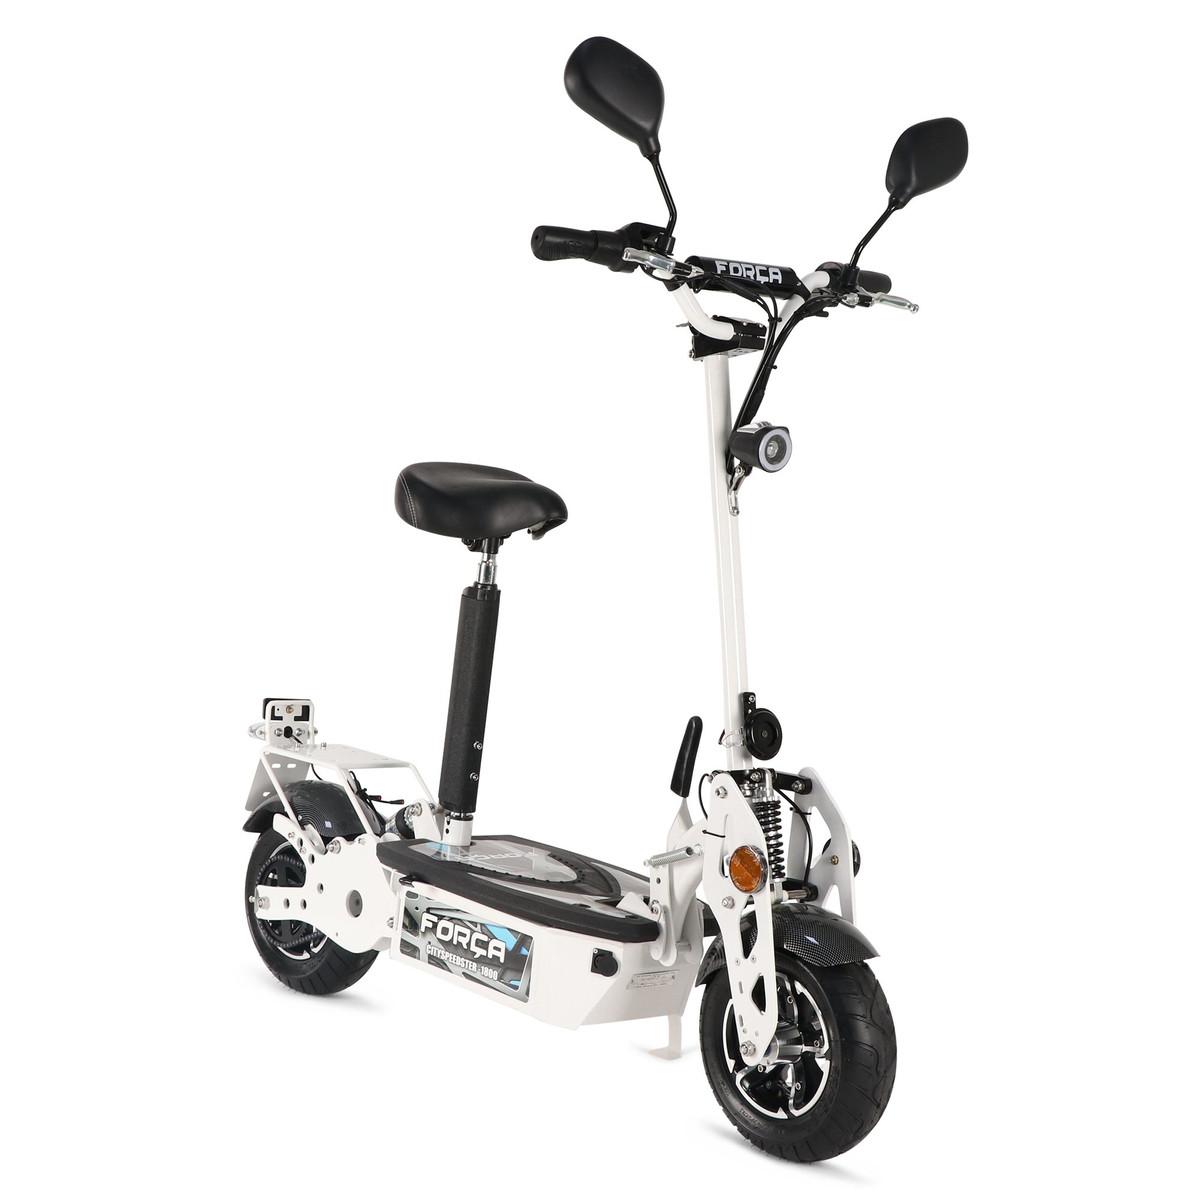 FORÇA CITYSPEEDSTER III 1800 WATT 45 KM/H ElektroScooter mit Strassenzulassung WEISS